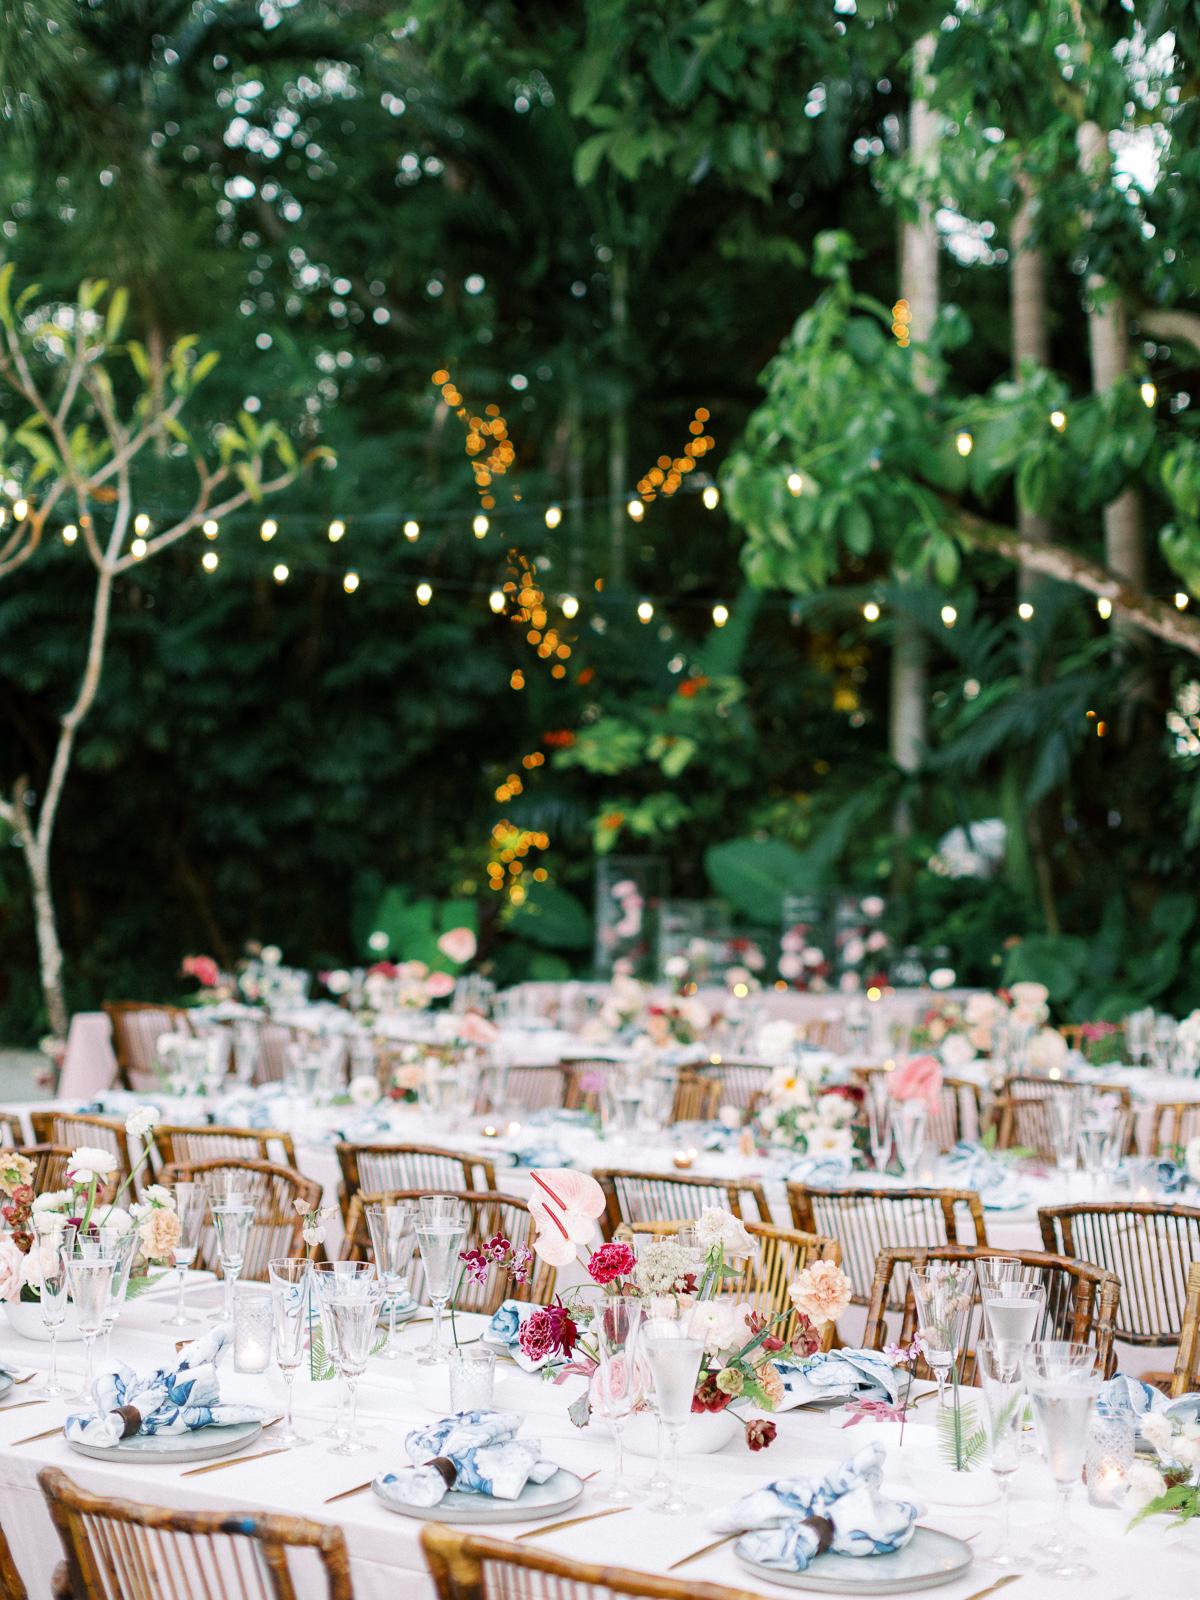 melissa lindsey wedding reception outdoor tables pink florals